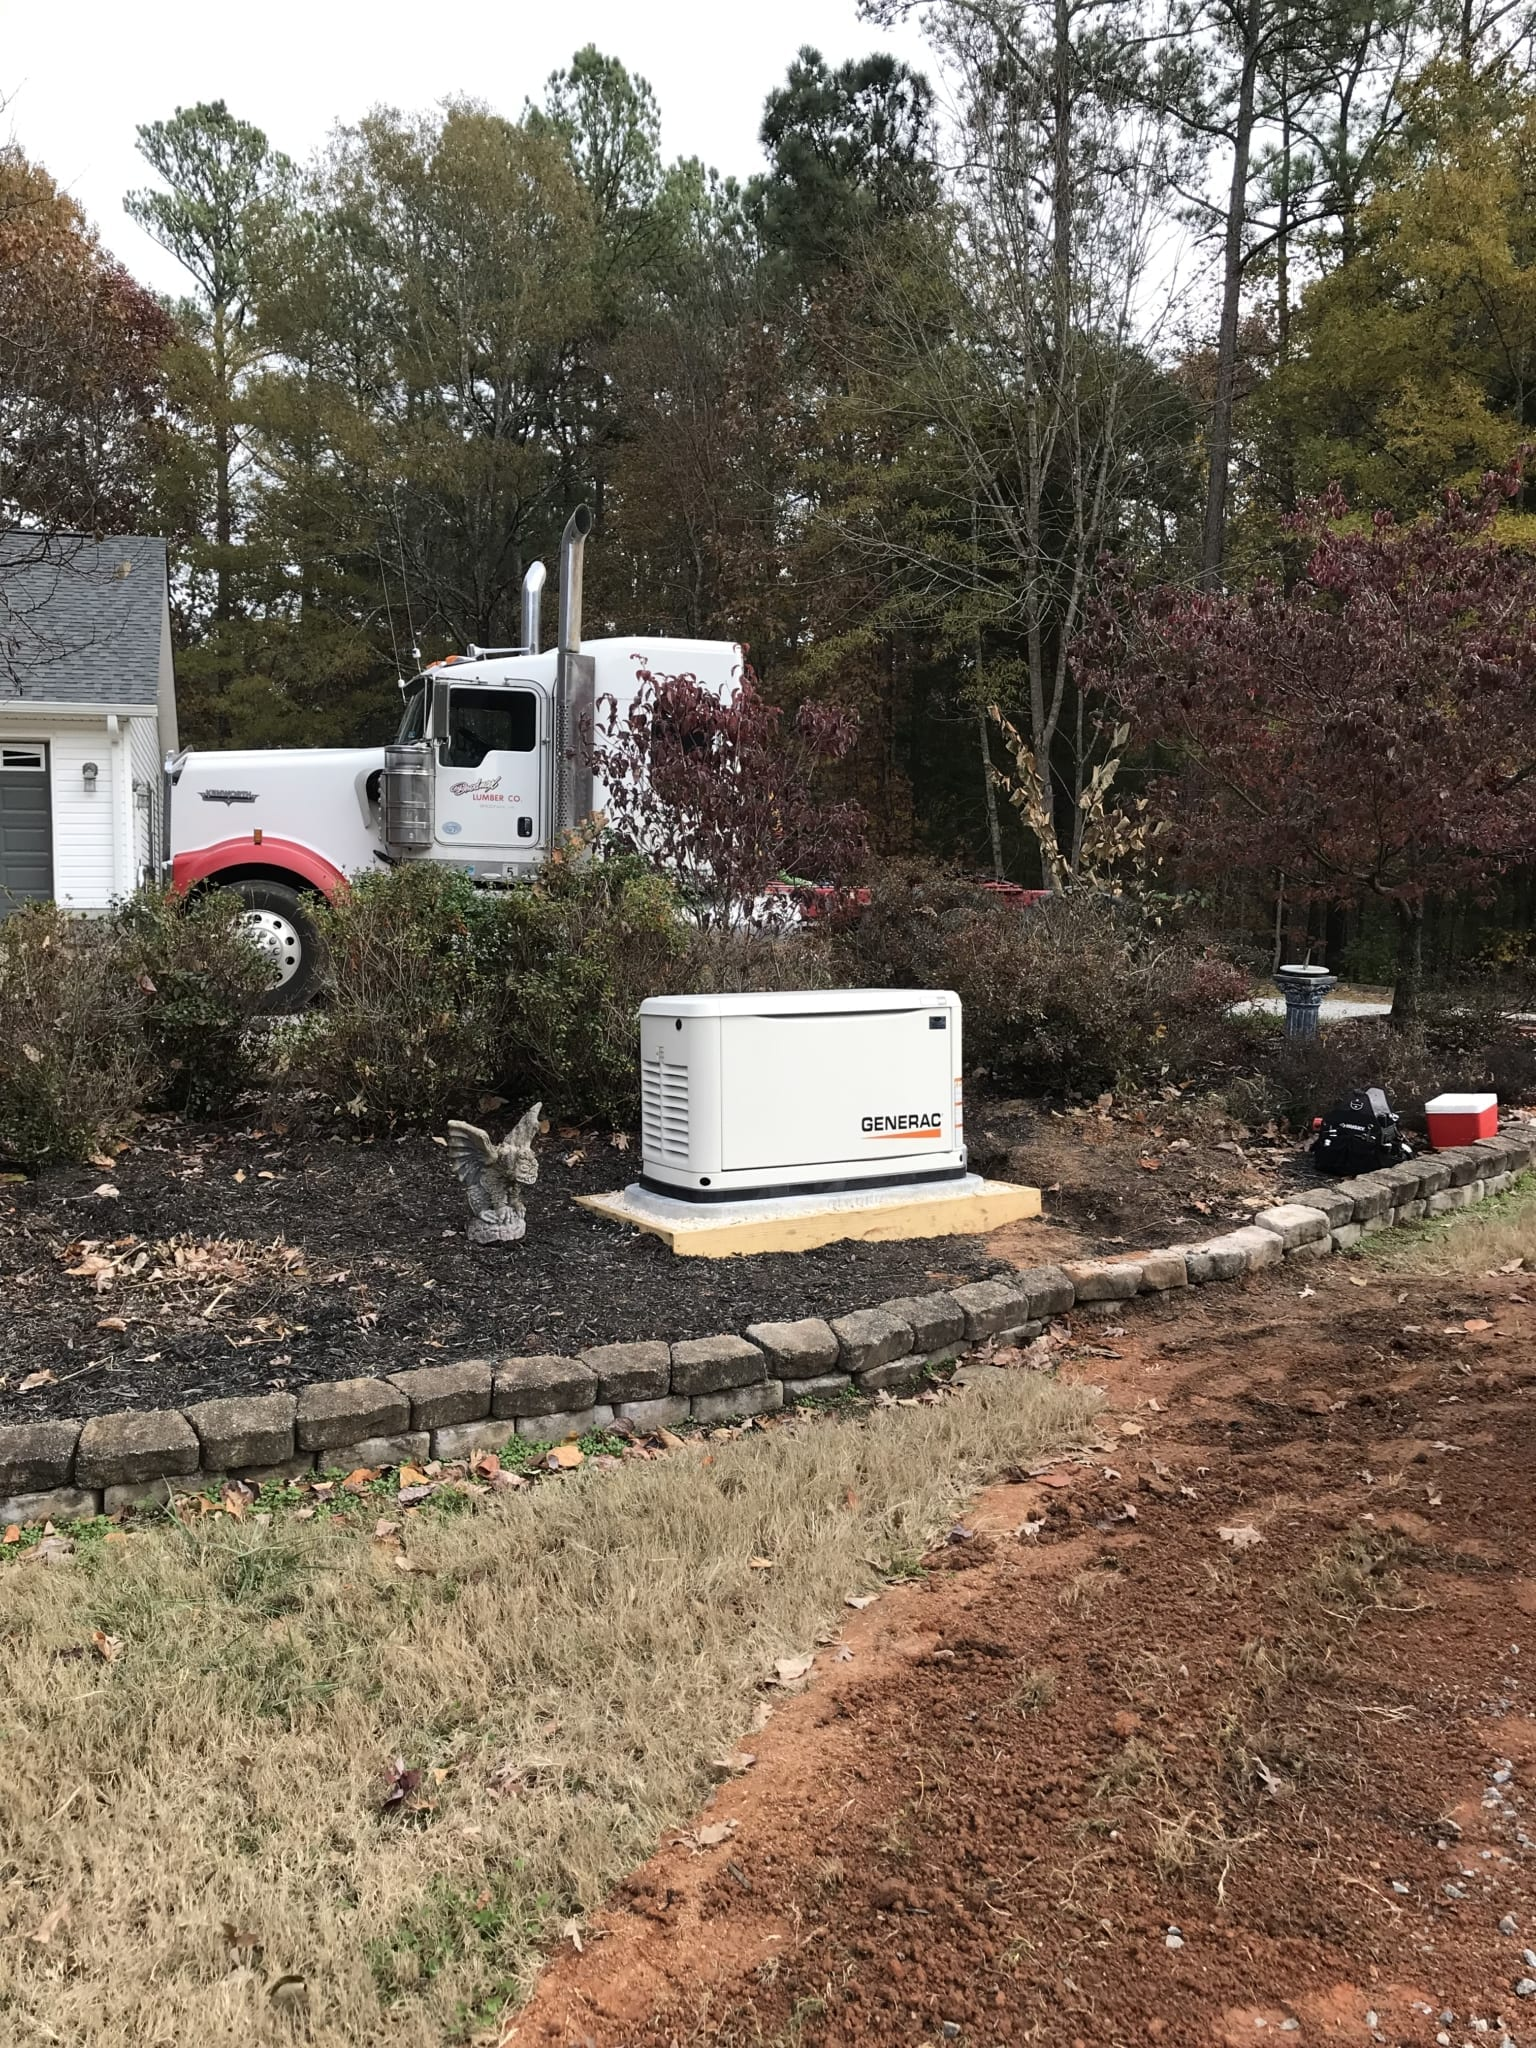 11.22.19 Lawrenceville Generac Automatic Standby Generator Far